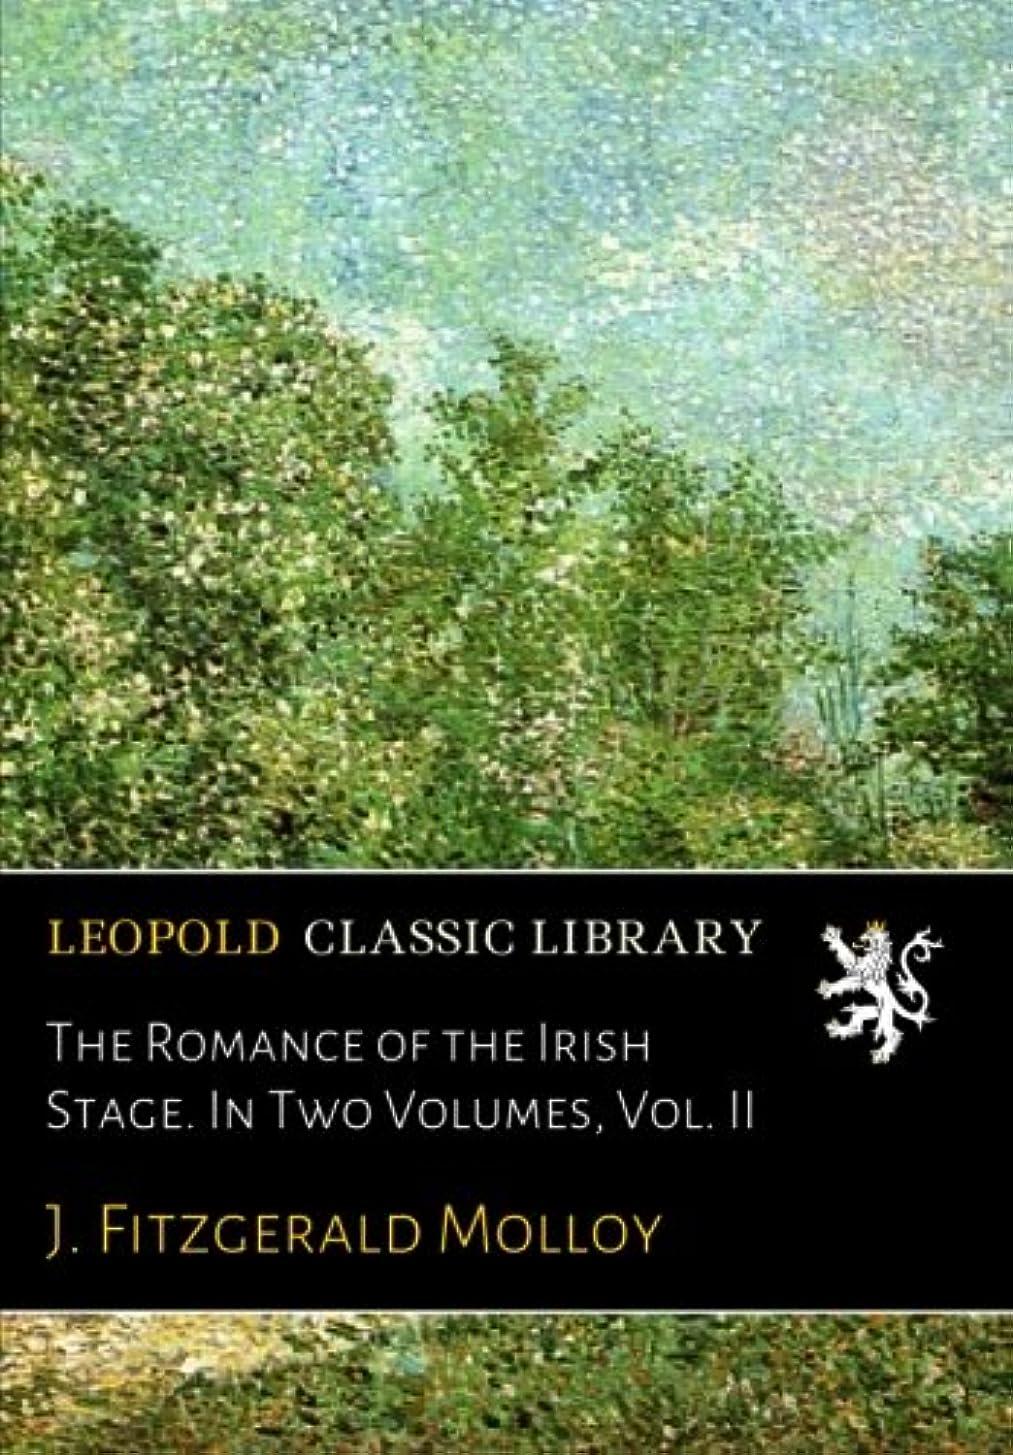 繁雑対人刺繍The Romance of the Irish Stage. In Two Volumes, Vol. II